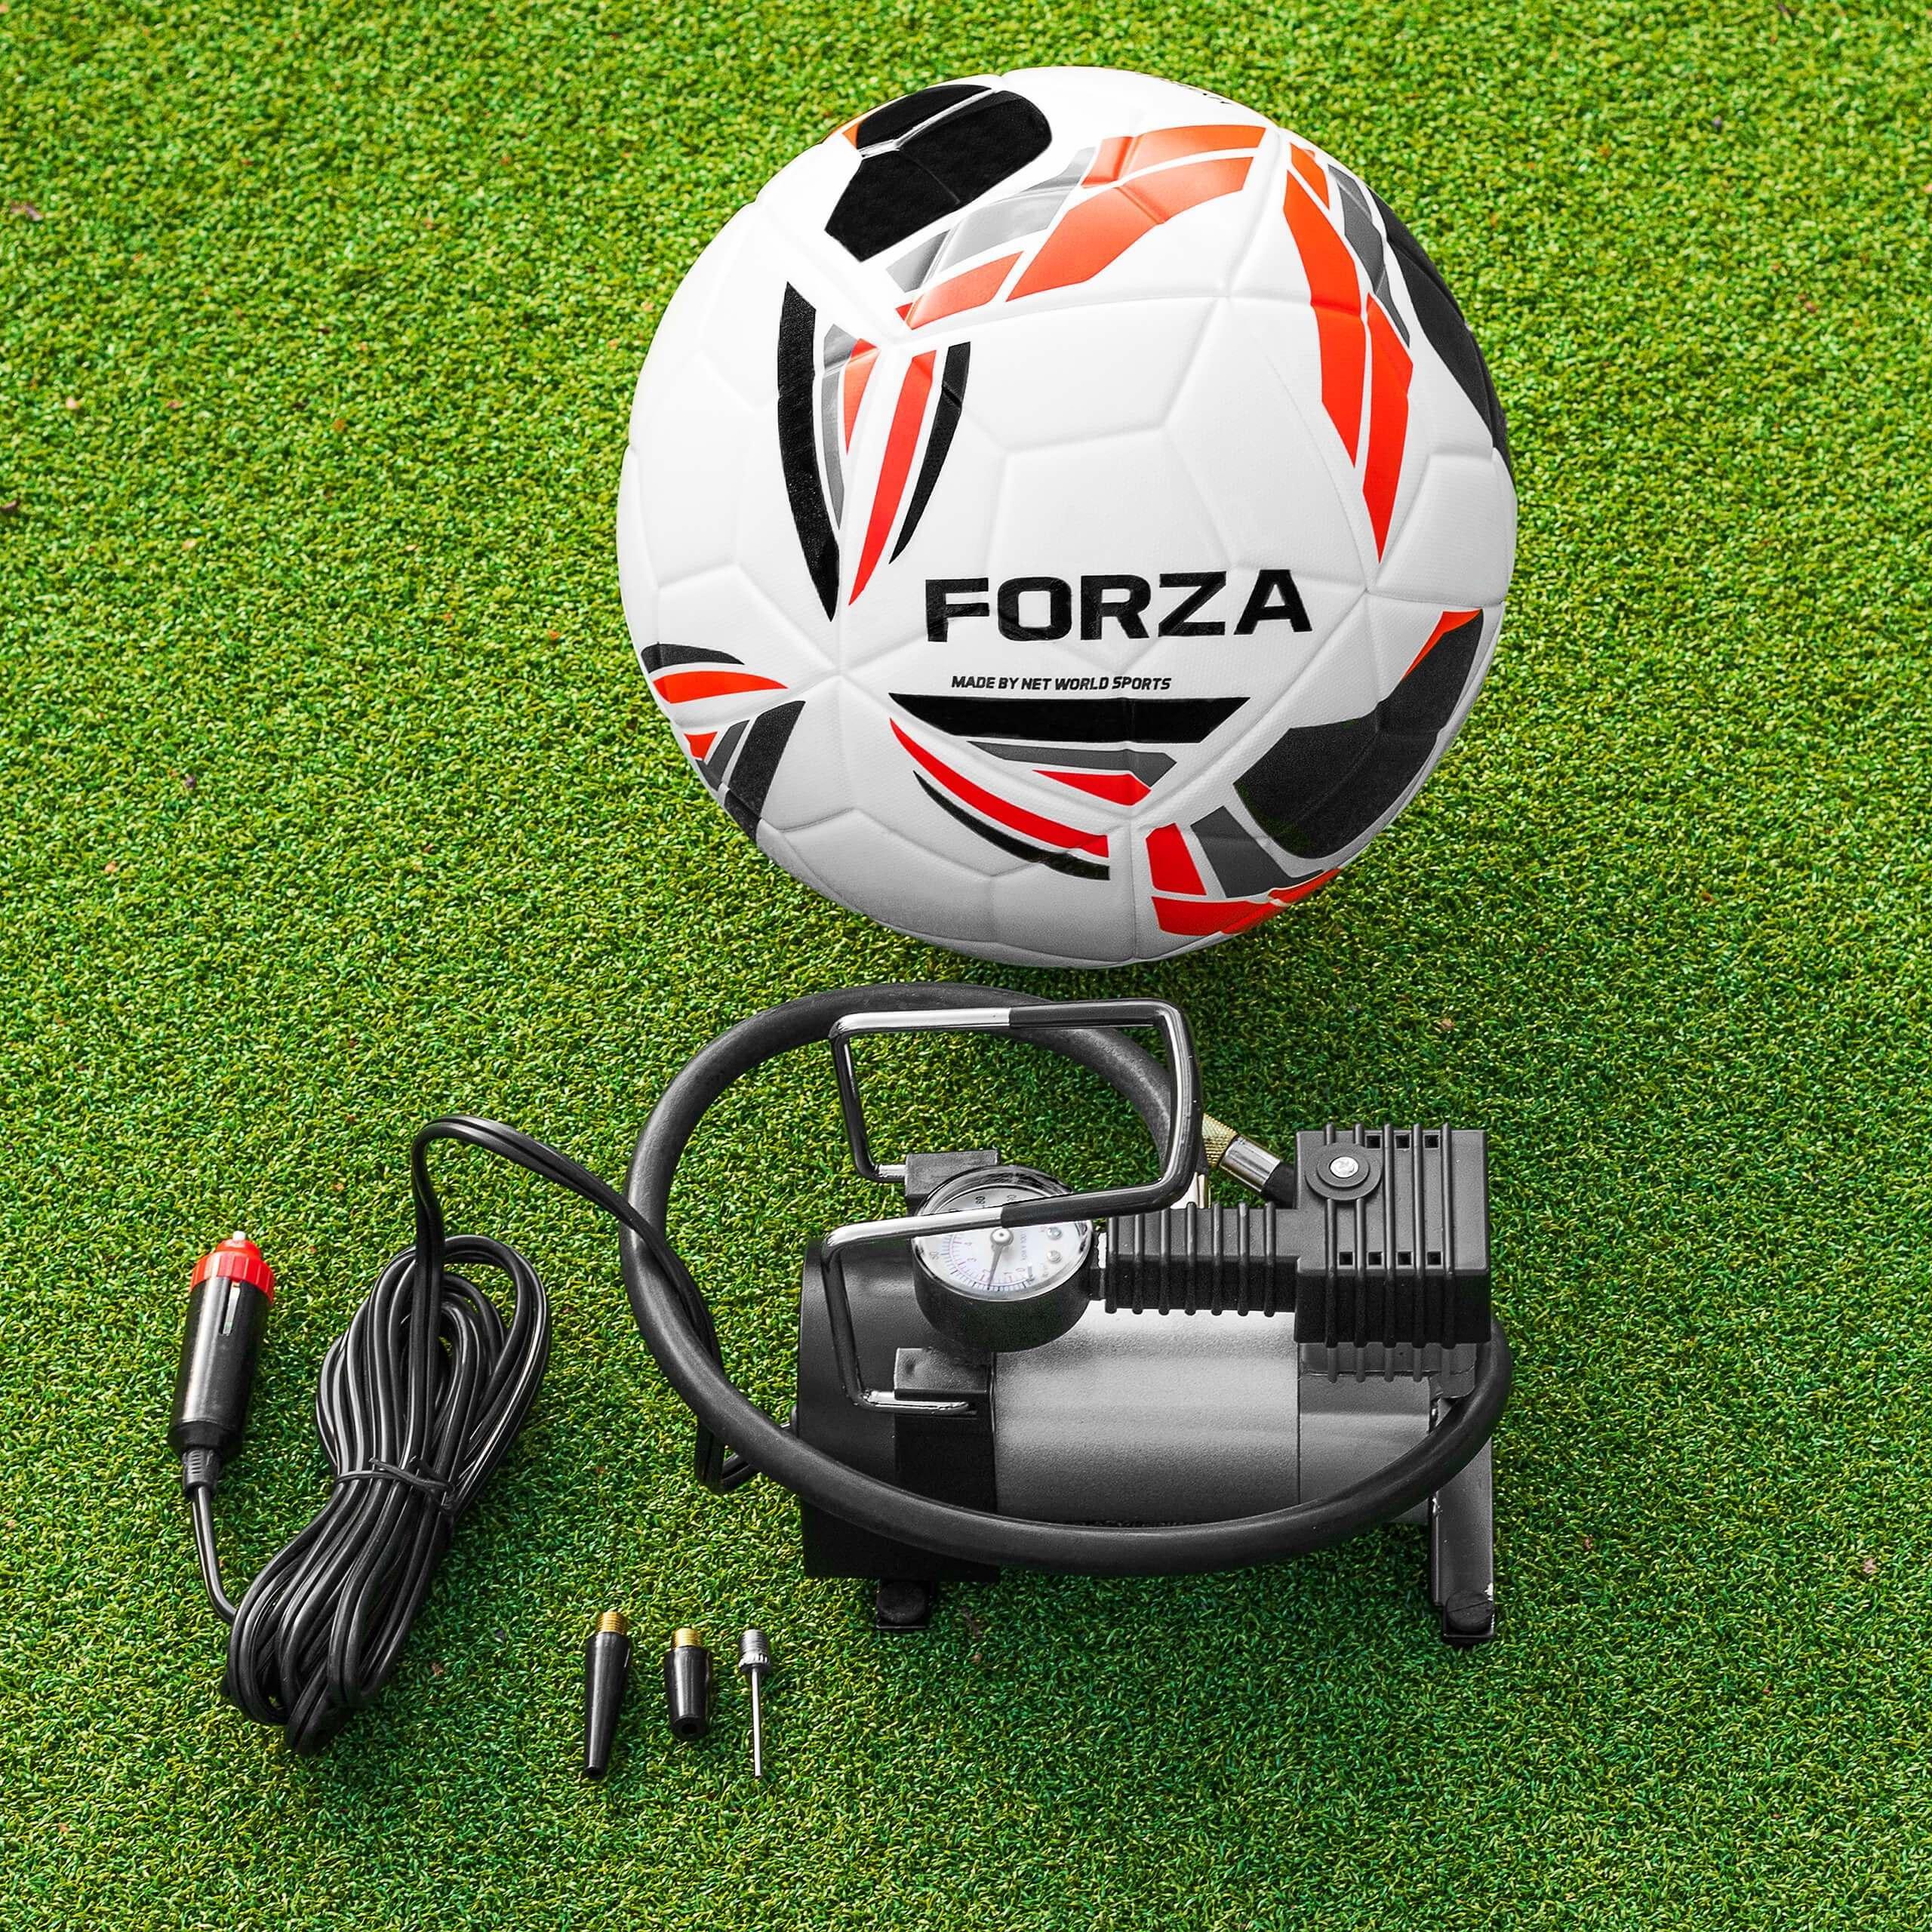 Football Sports Ball Accessories Soccer Balls Inflating Pump Needle Adaptors